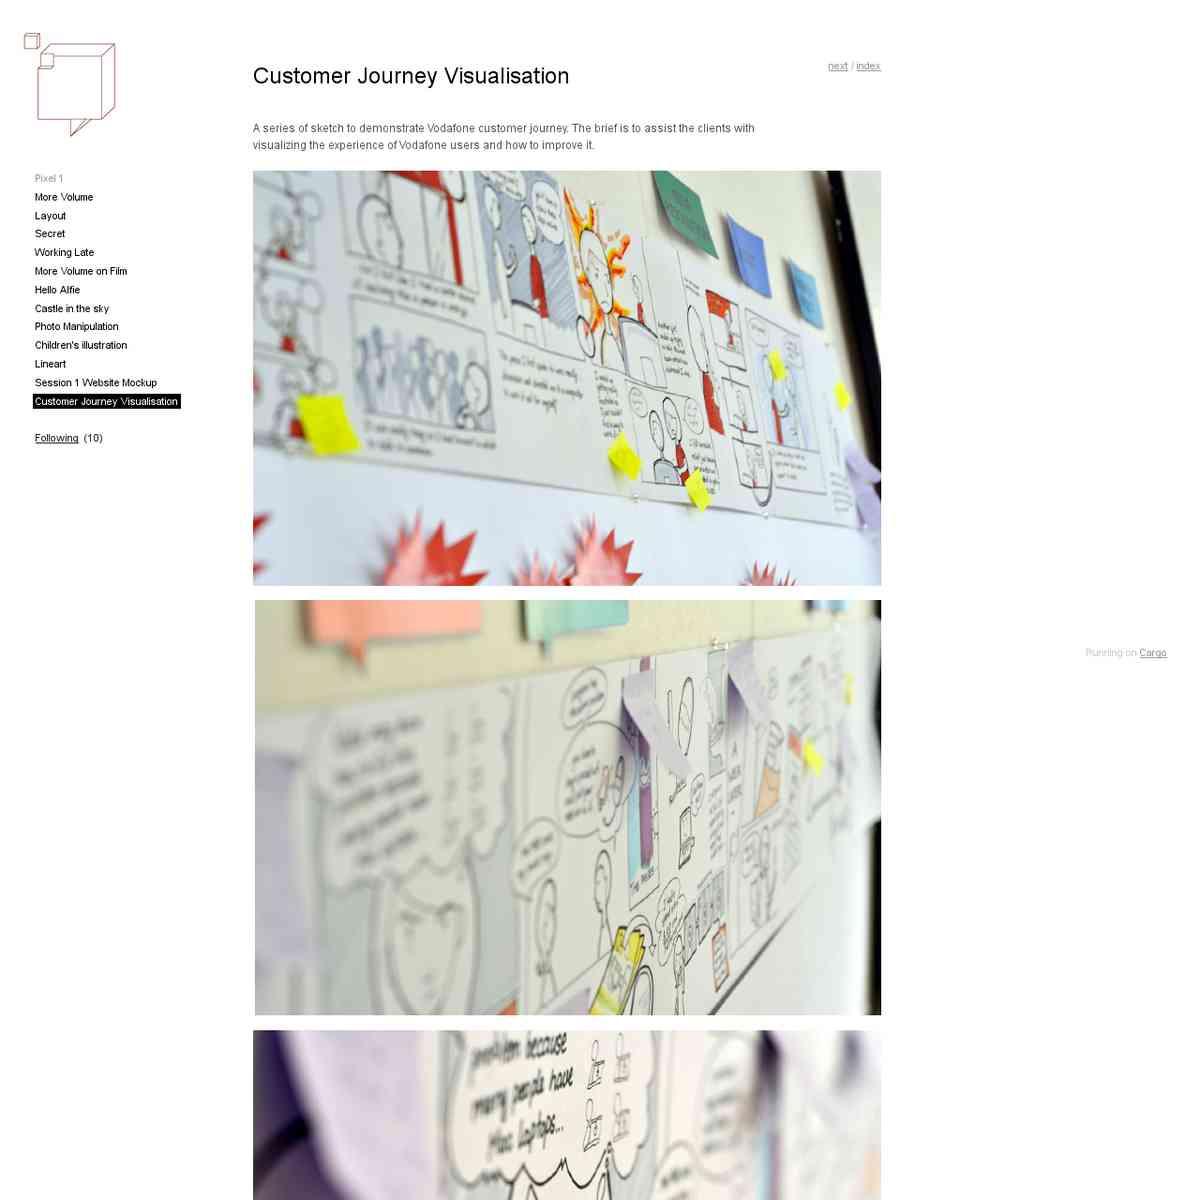 cargocollective.com/25pixel/Customer-Journey-Visualisation